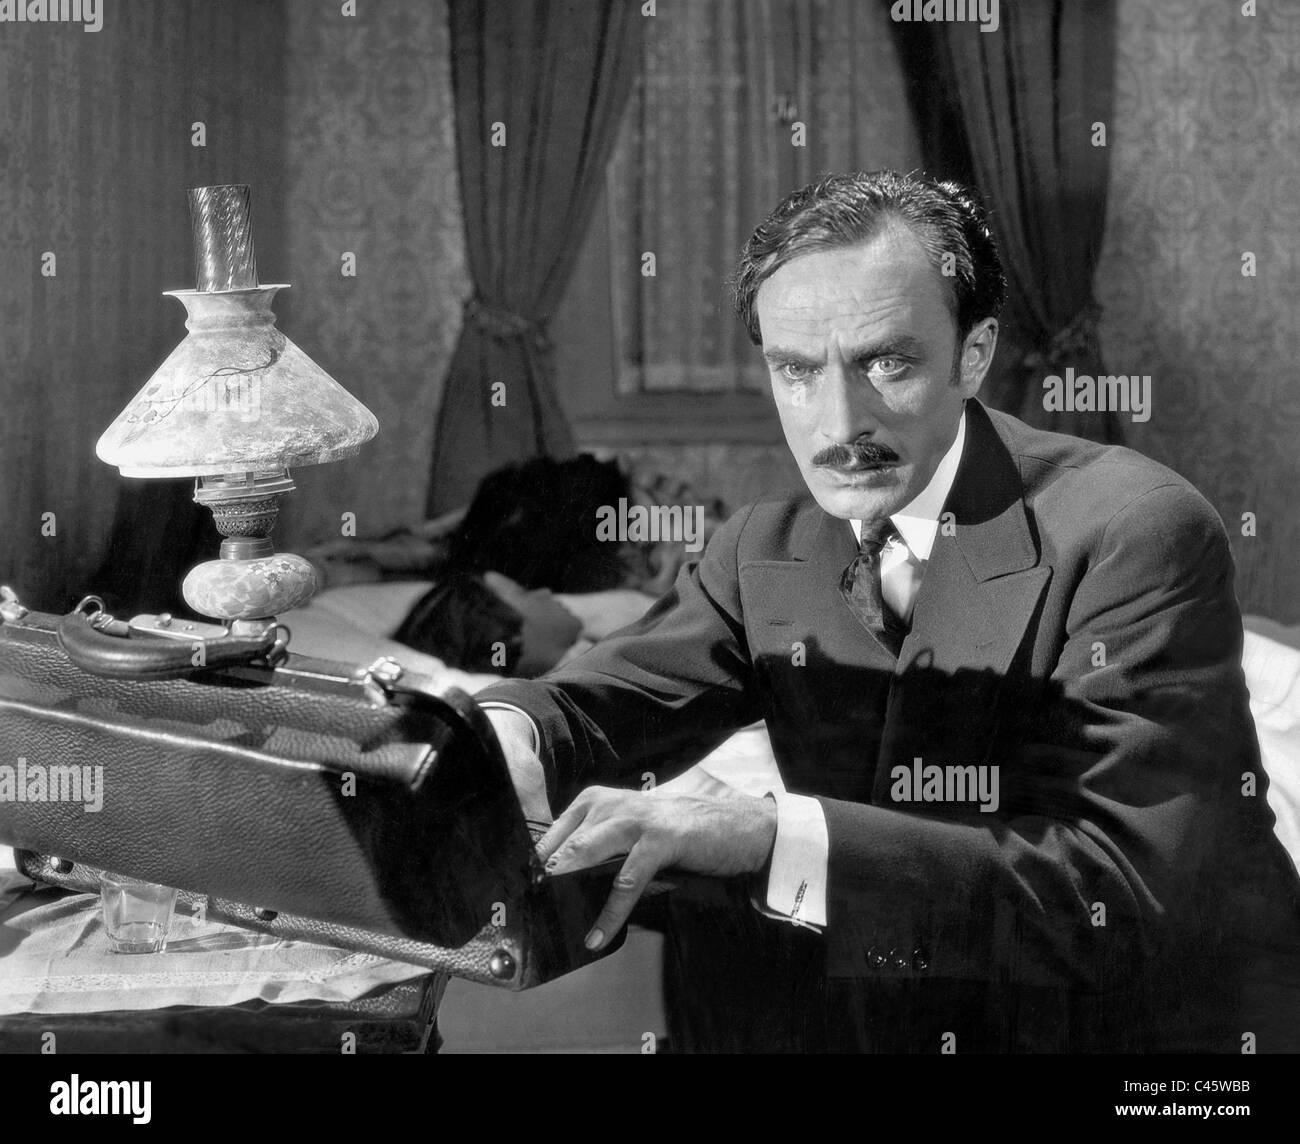 Conrad Veidt in 'A man's past', 1927 - Stock Image